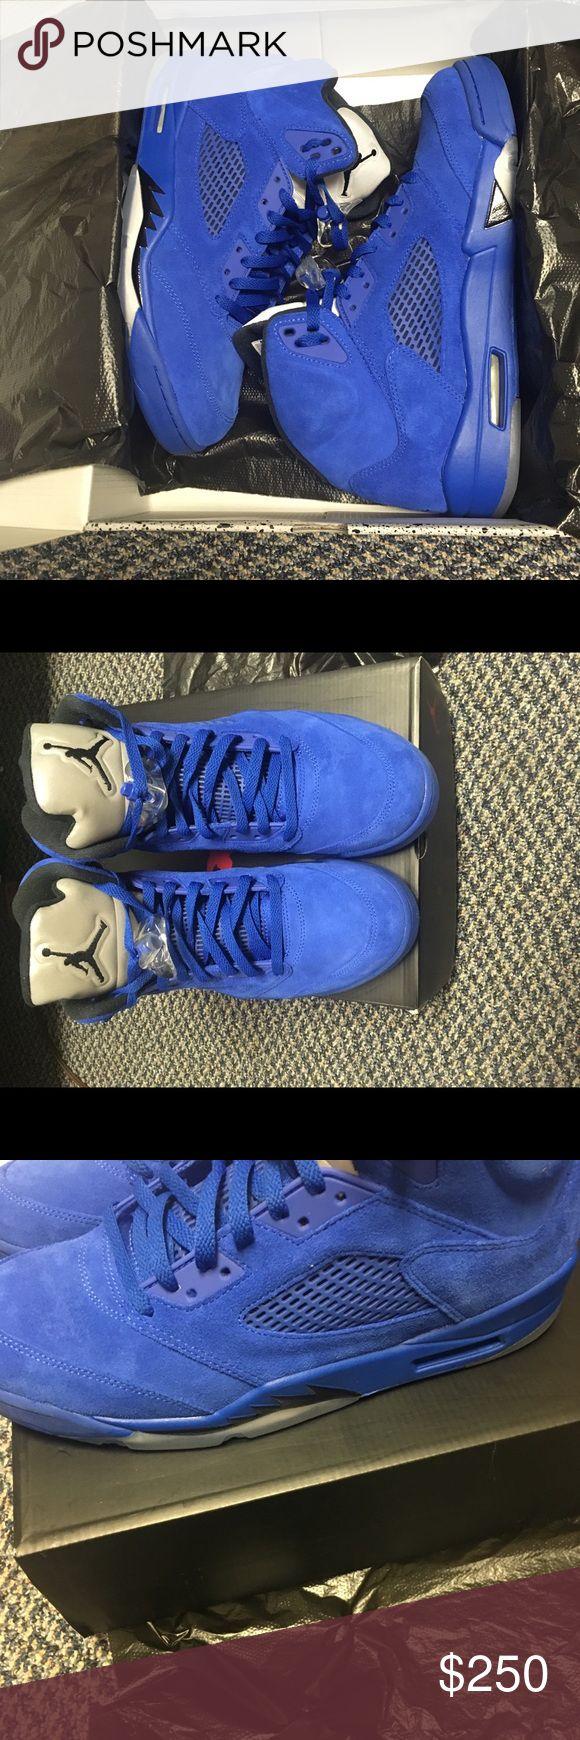 Retro Jordan 5s Blue retro Jordan's 5 size 11.5 willing to negotiate price text 313-636-4356 for more questions & picture Jordan Shoes Sneakers